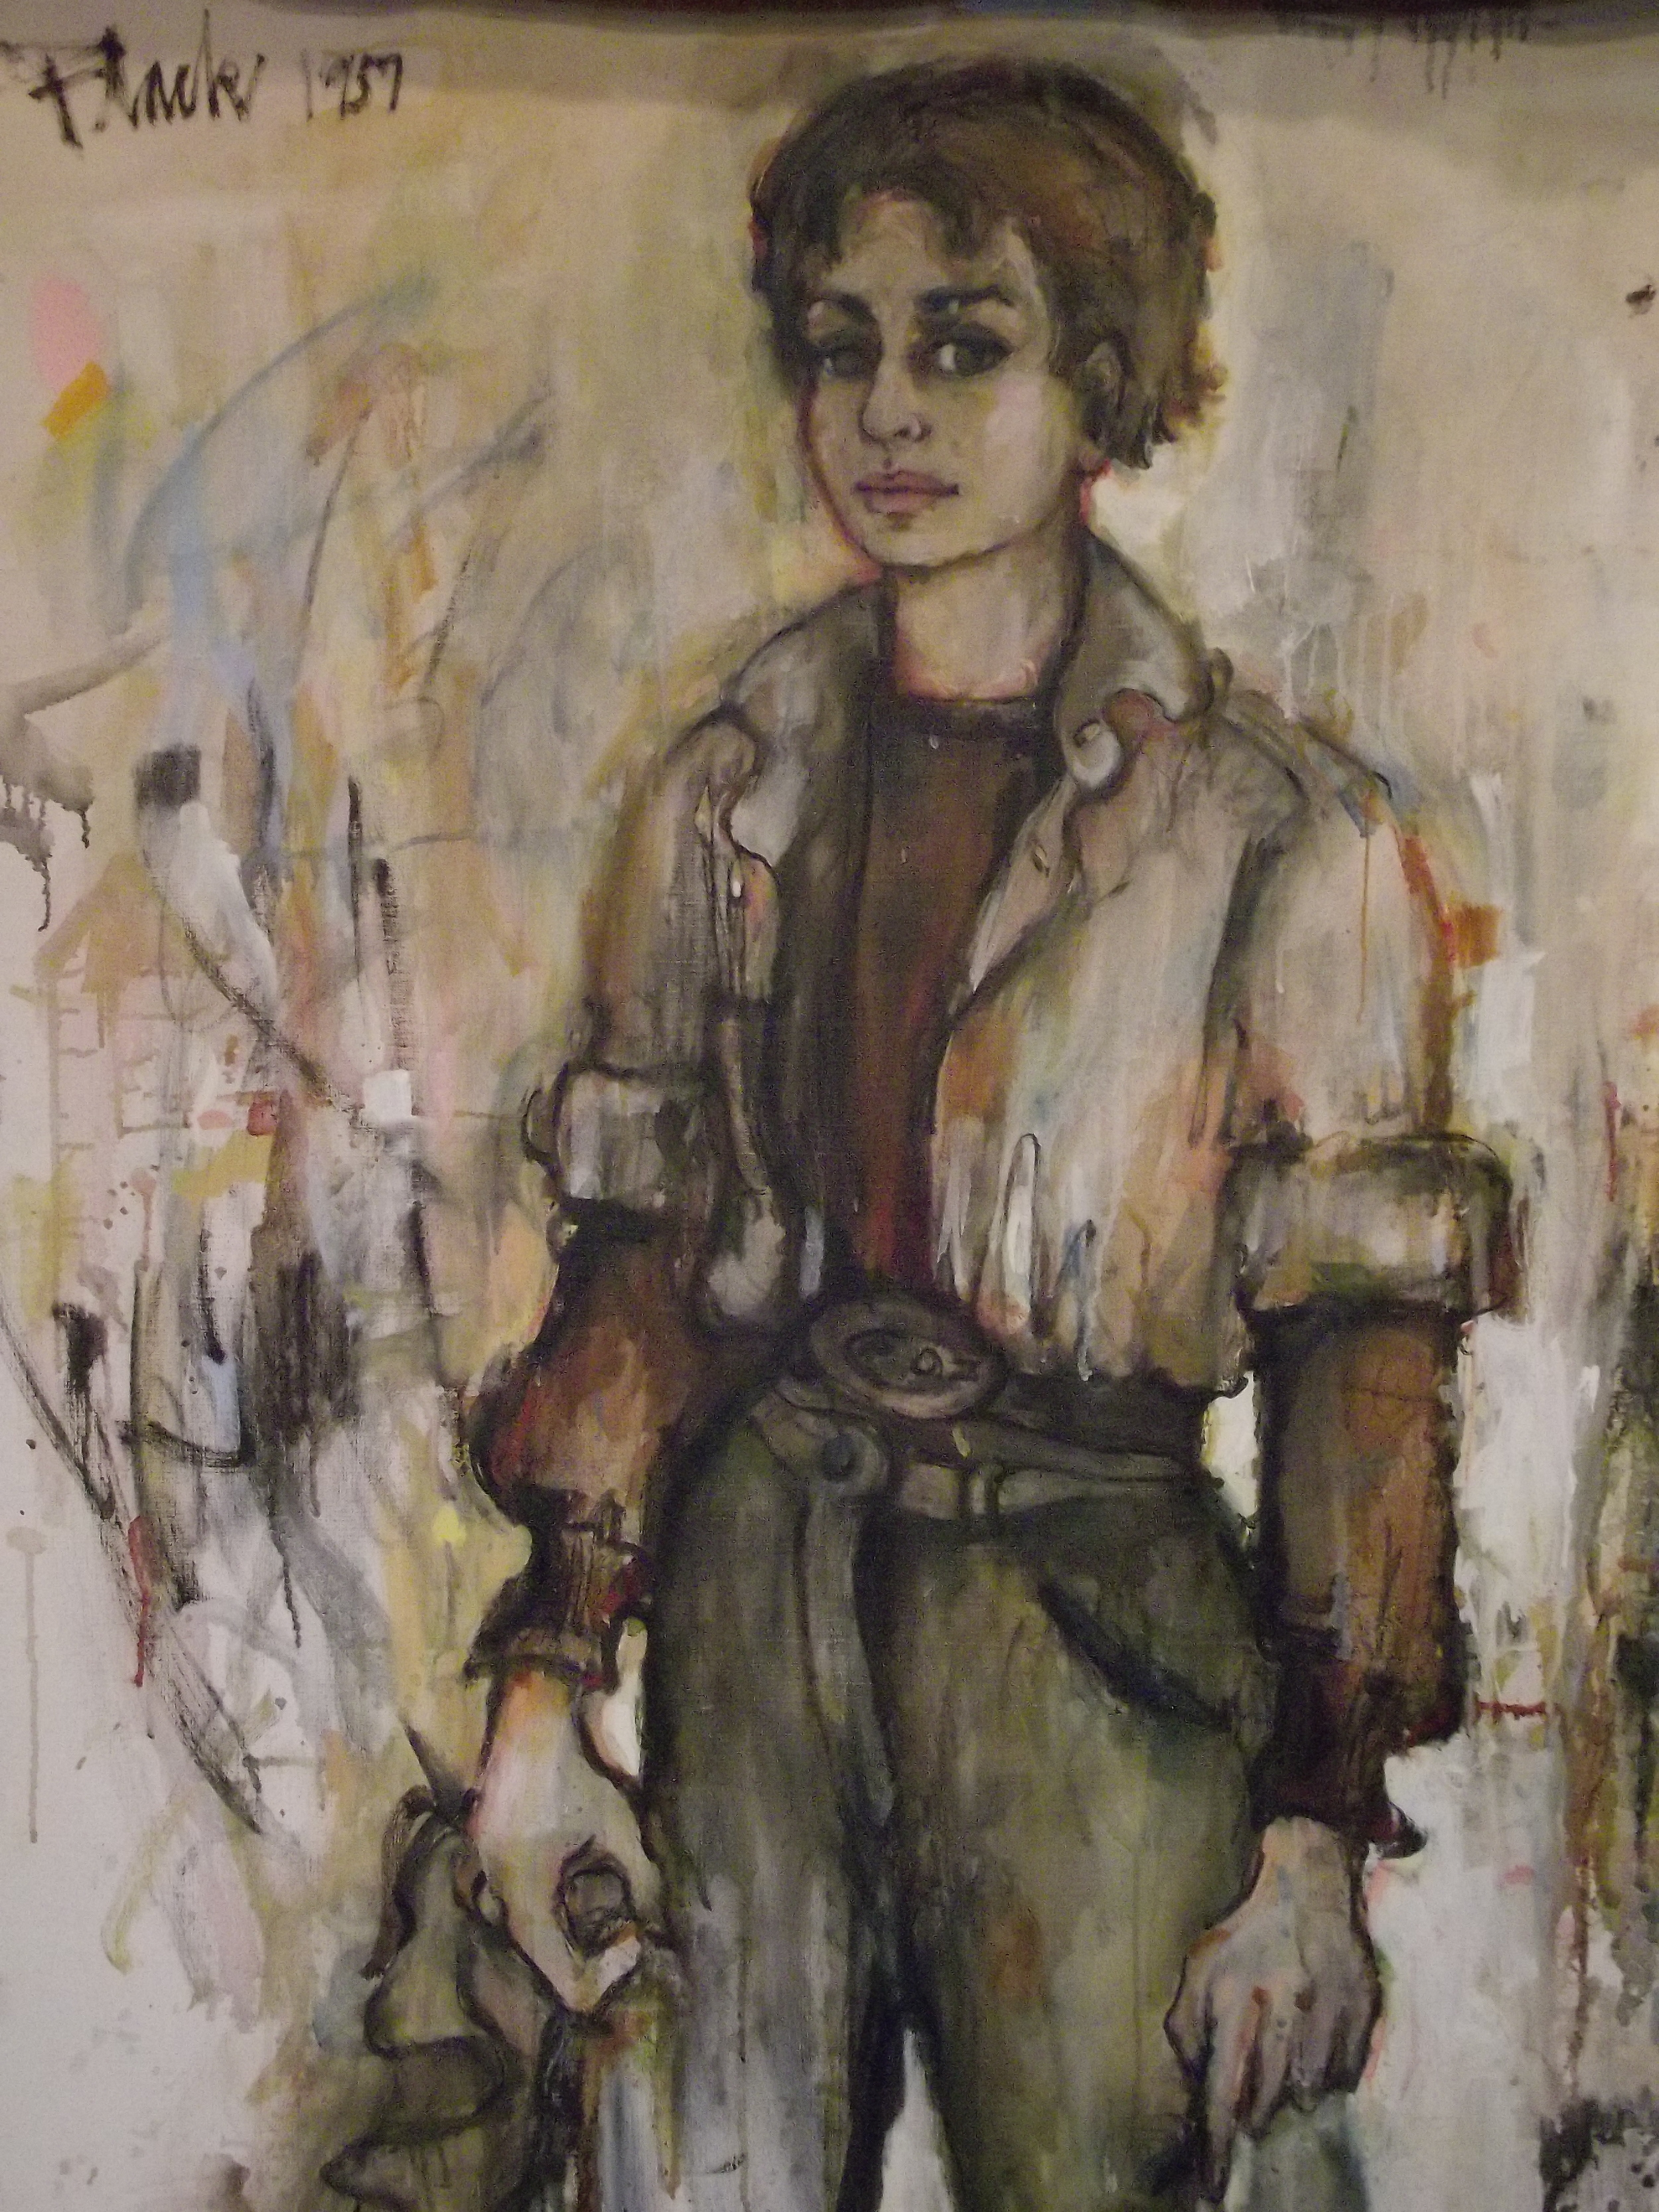 Self Portrait 1957